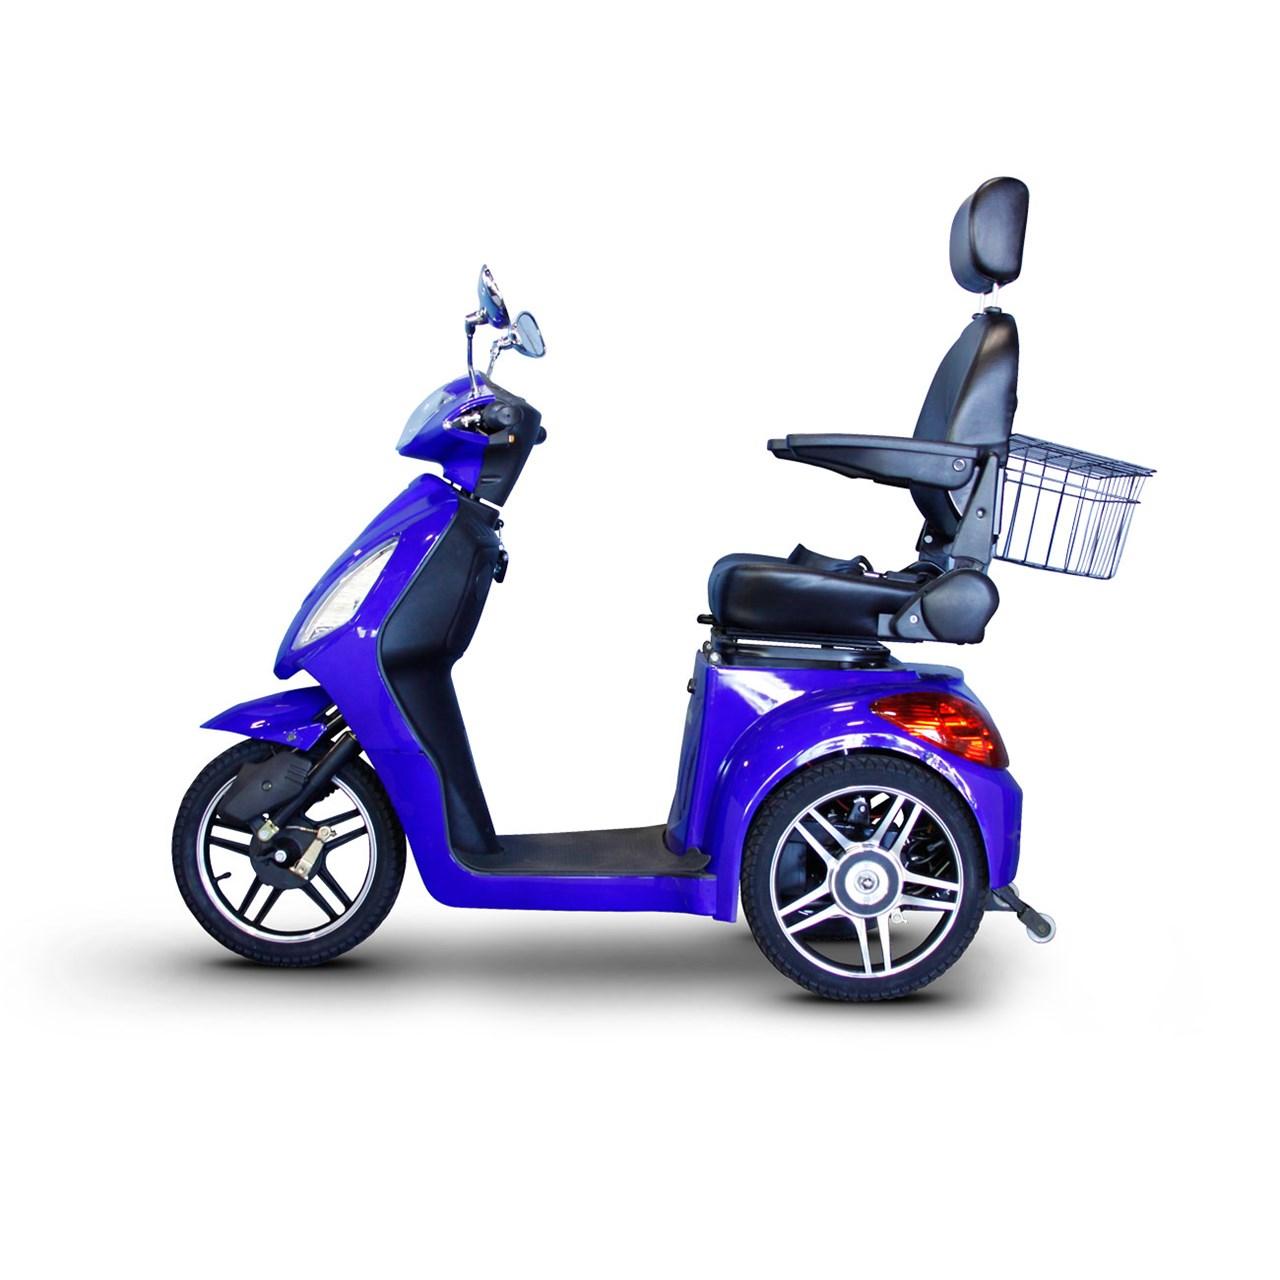 Maxiaids E Wheels Ew 36 3 Wheel Electric Senior Mobility Scooter Blue